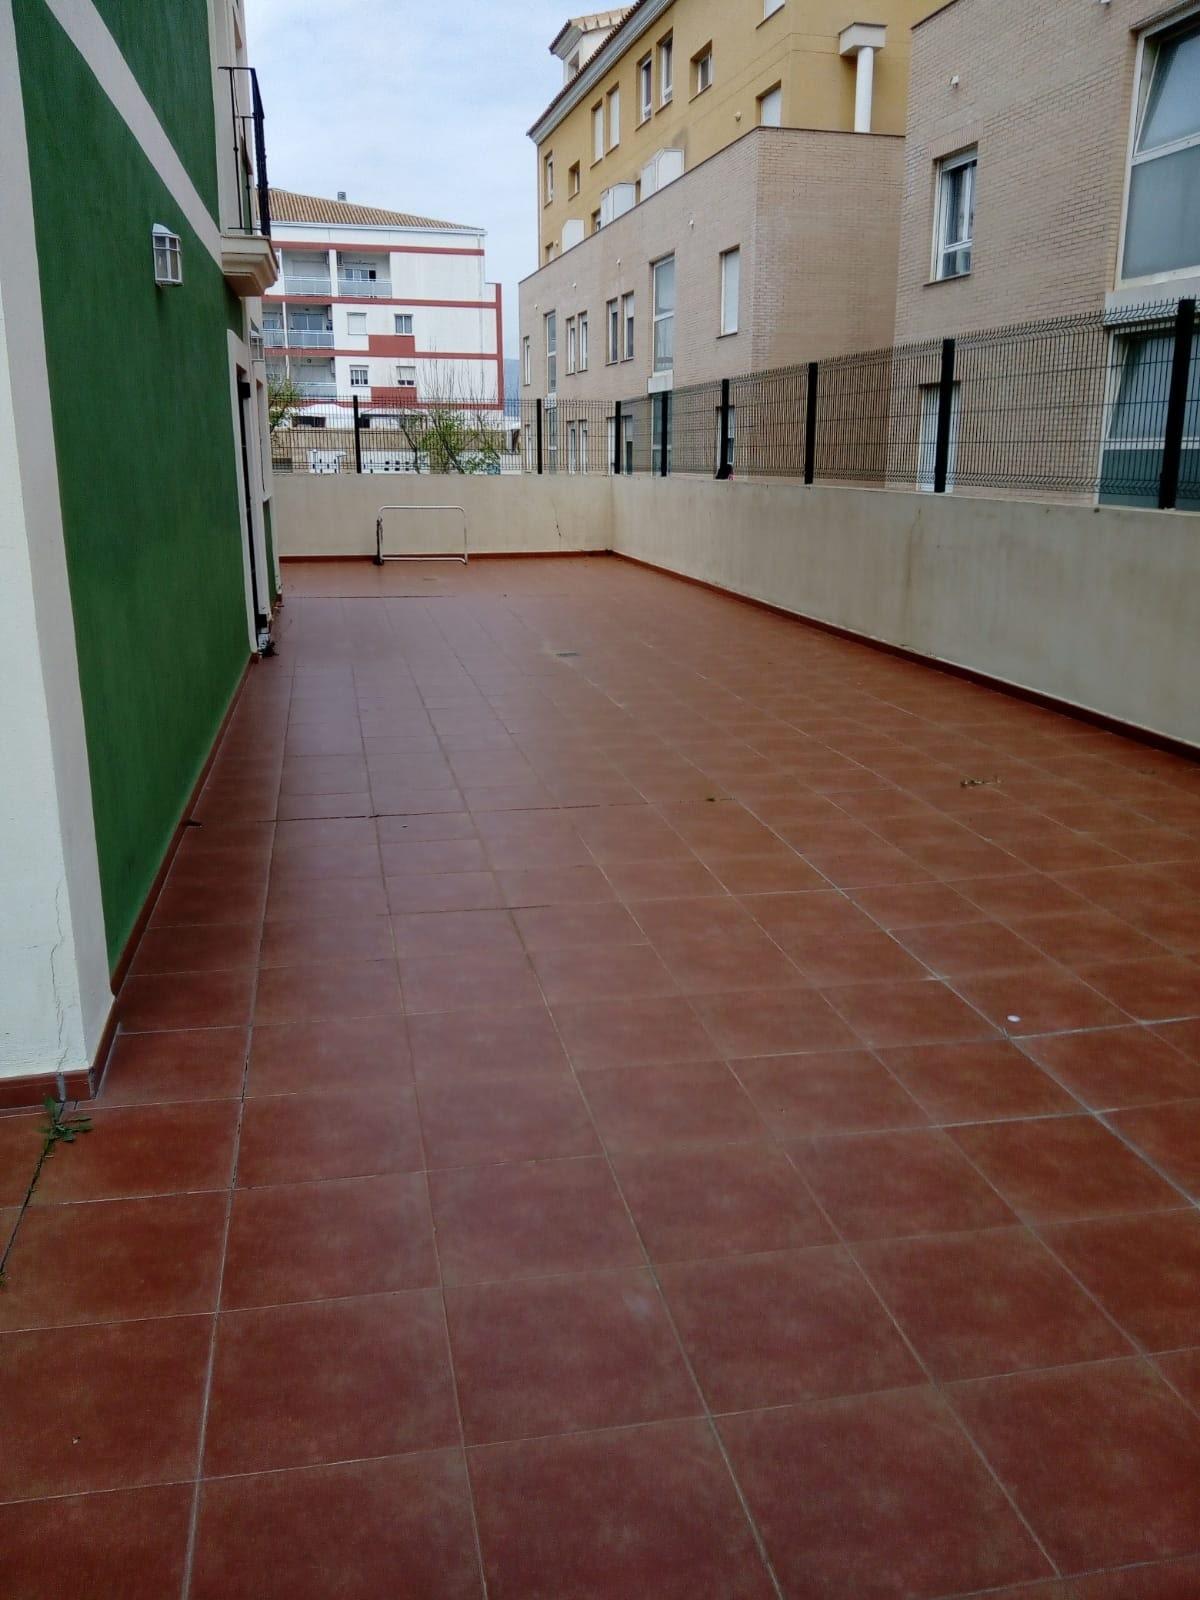 vitalcasa.sooprema-propiedades_5e96e07f81aa1-source